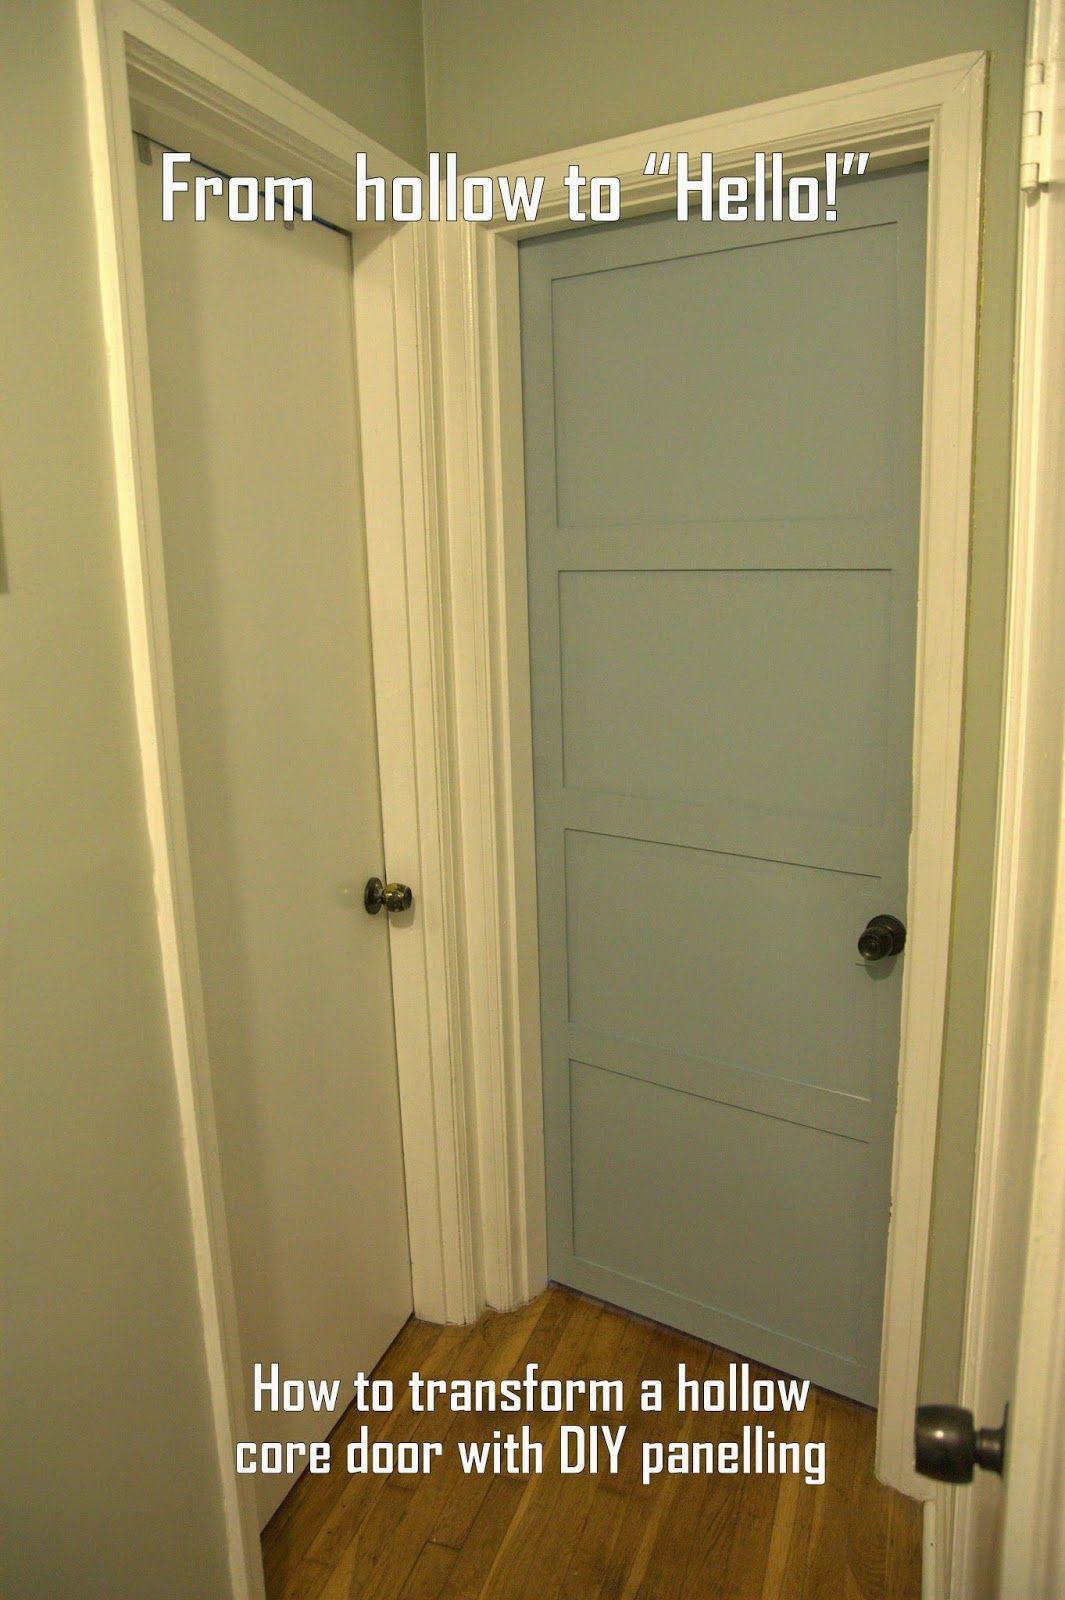 DIY hollow core doors to doors with trim: My Old Kentucky